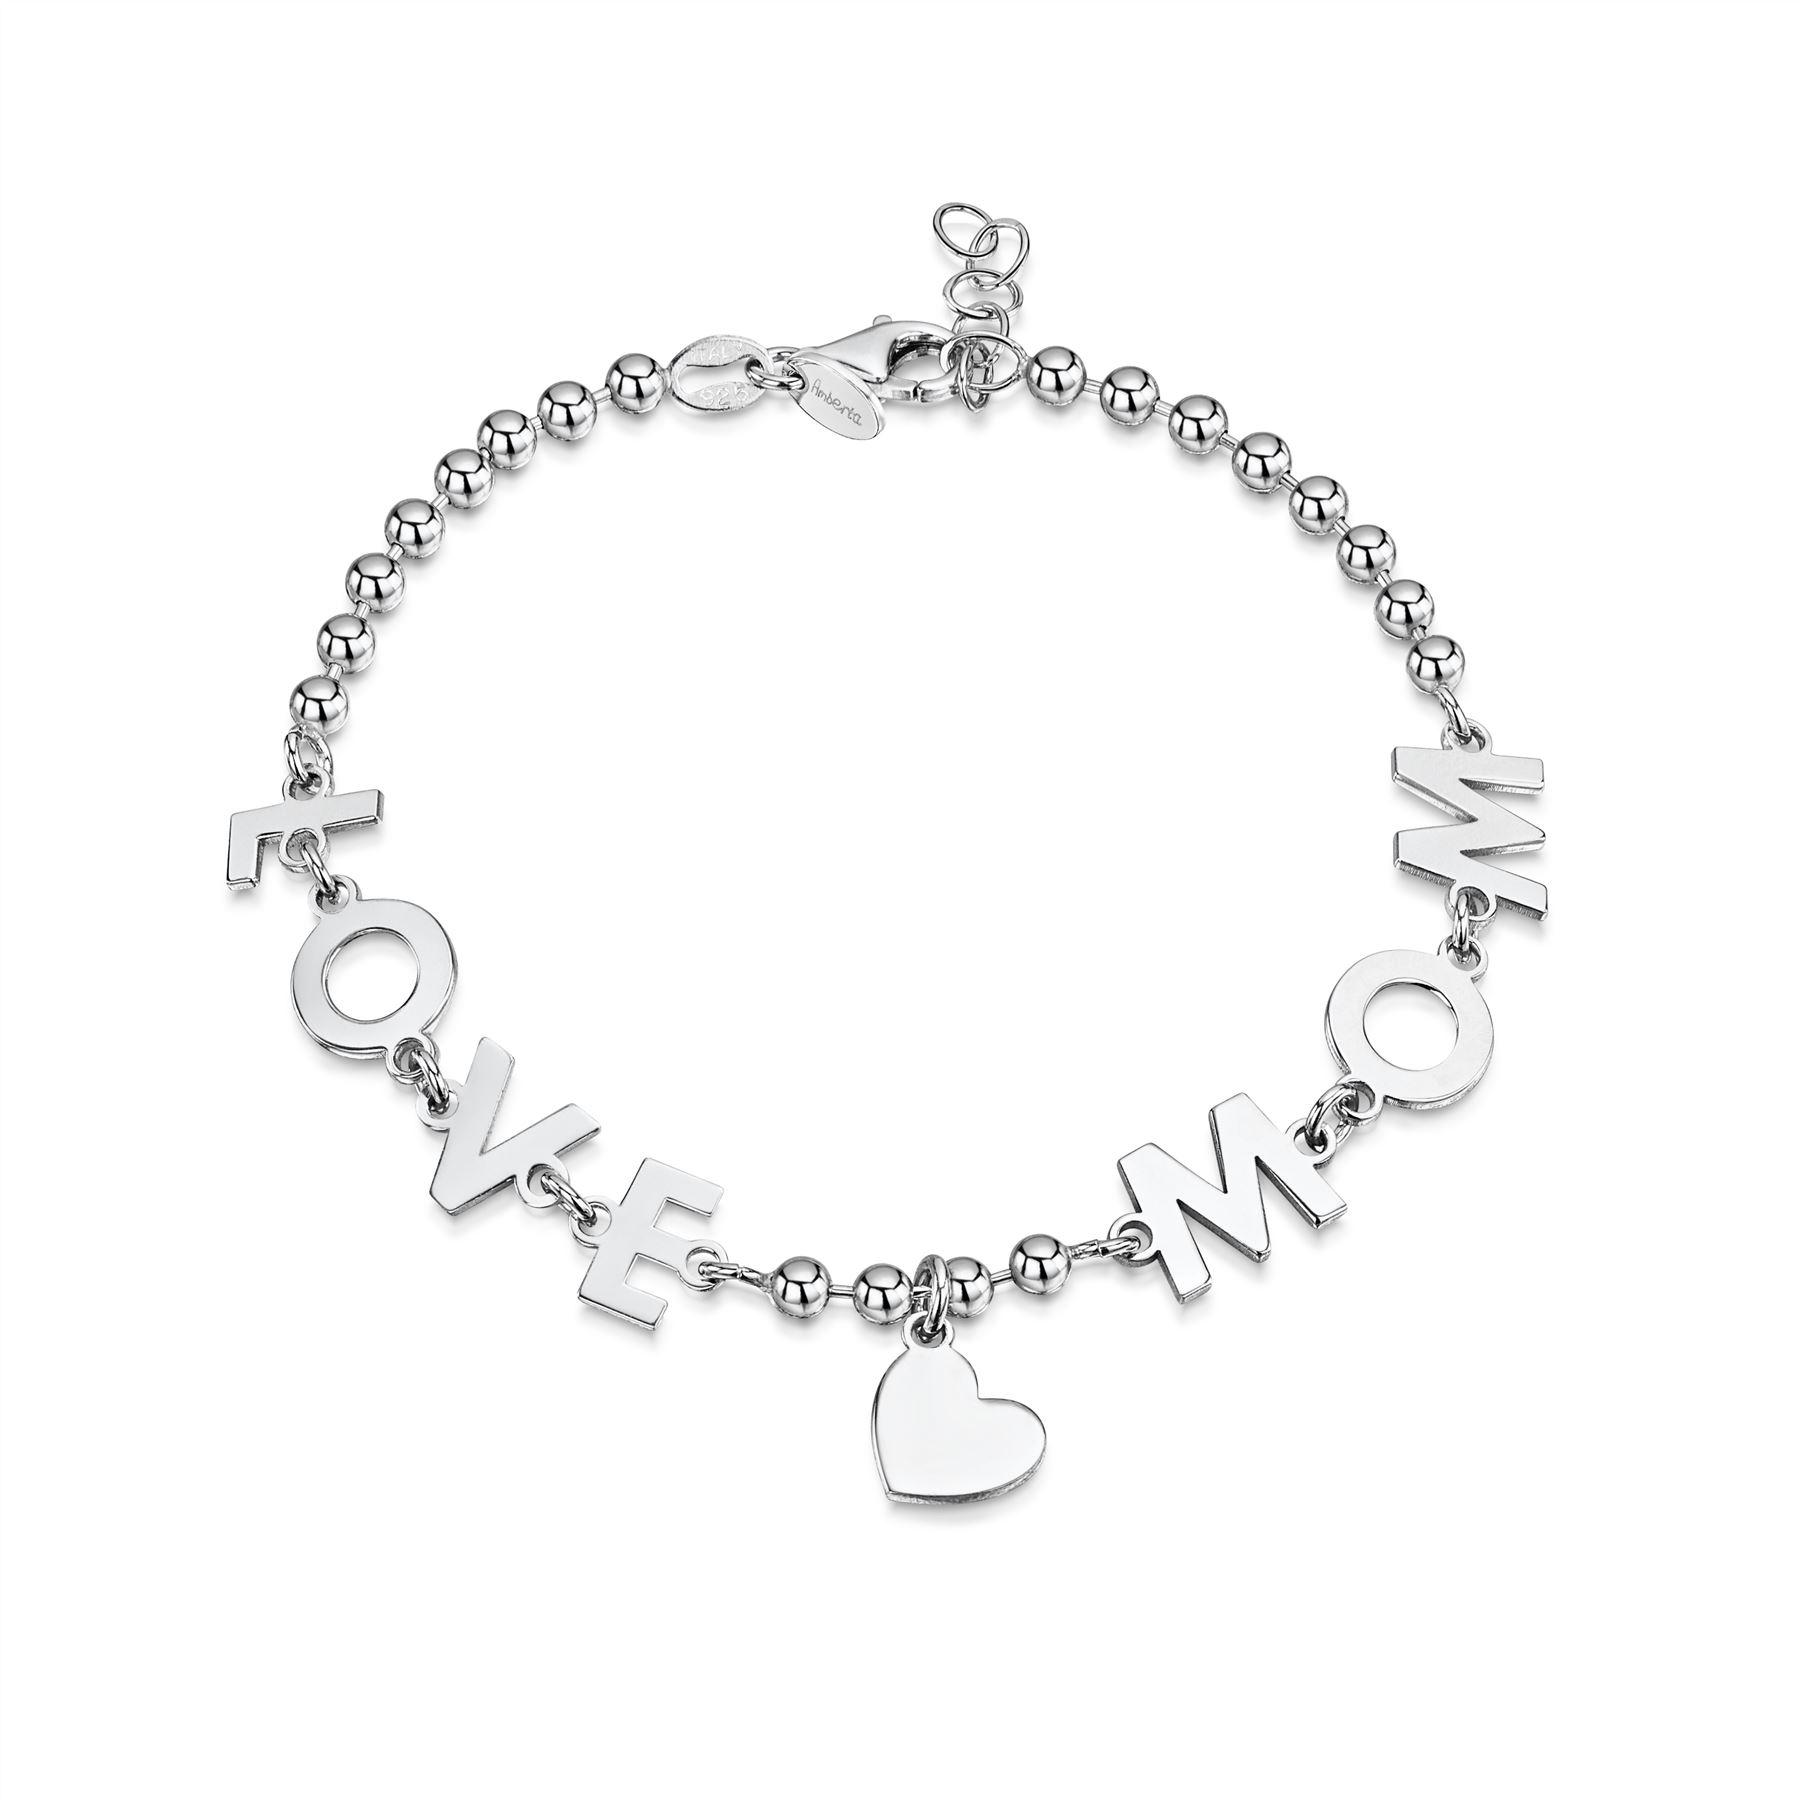 Amberta-Jewelry-925-Sterling-Silver-Adjustable-Bracelet-Italian-Bangle-for-Women thumbnail 81